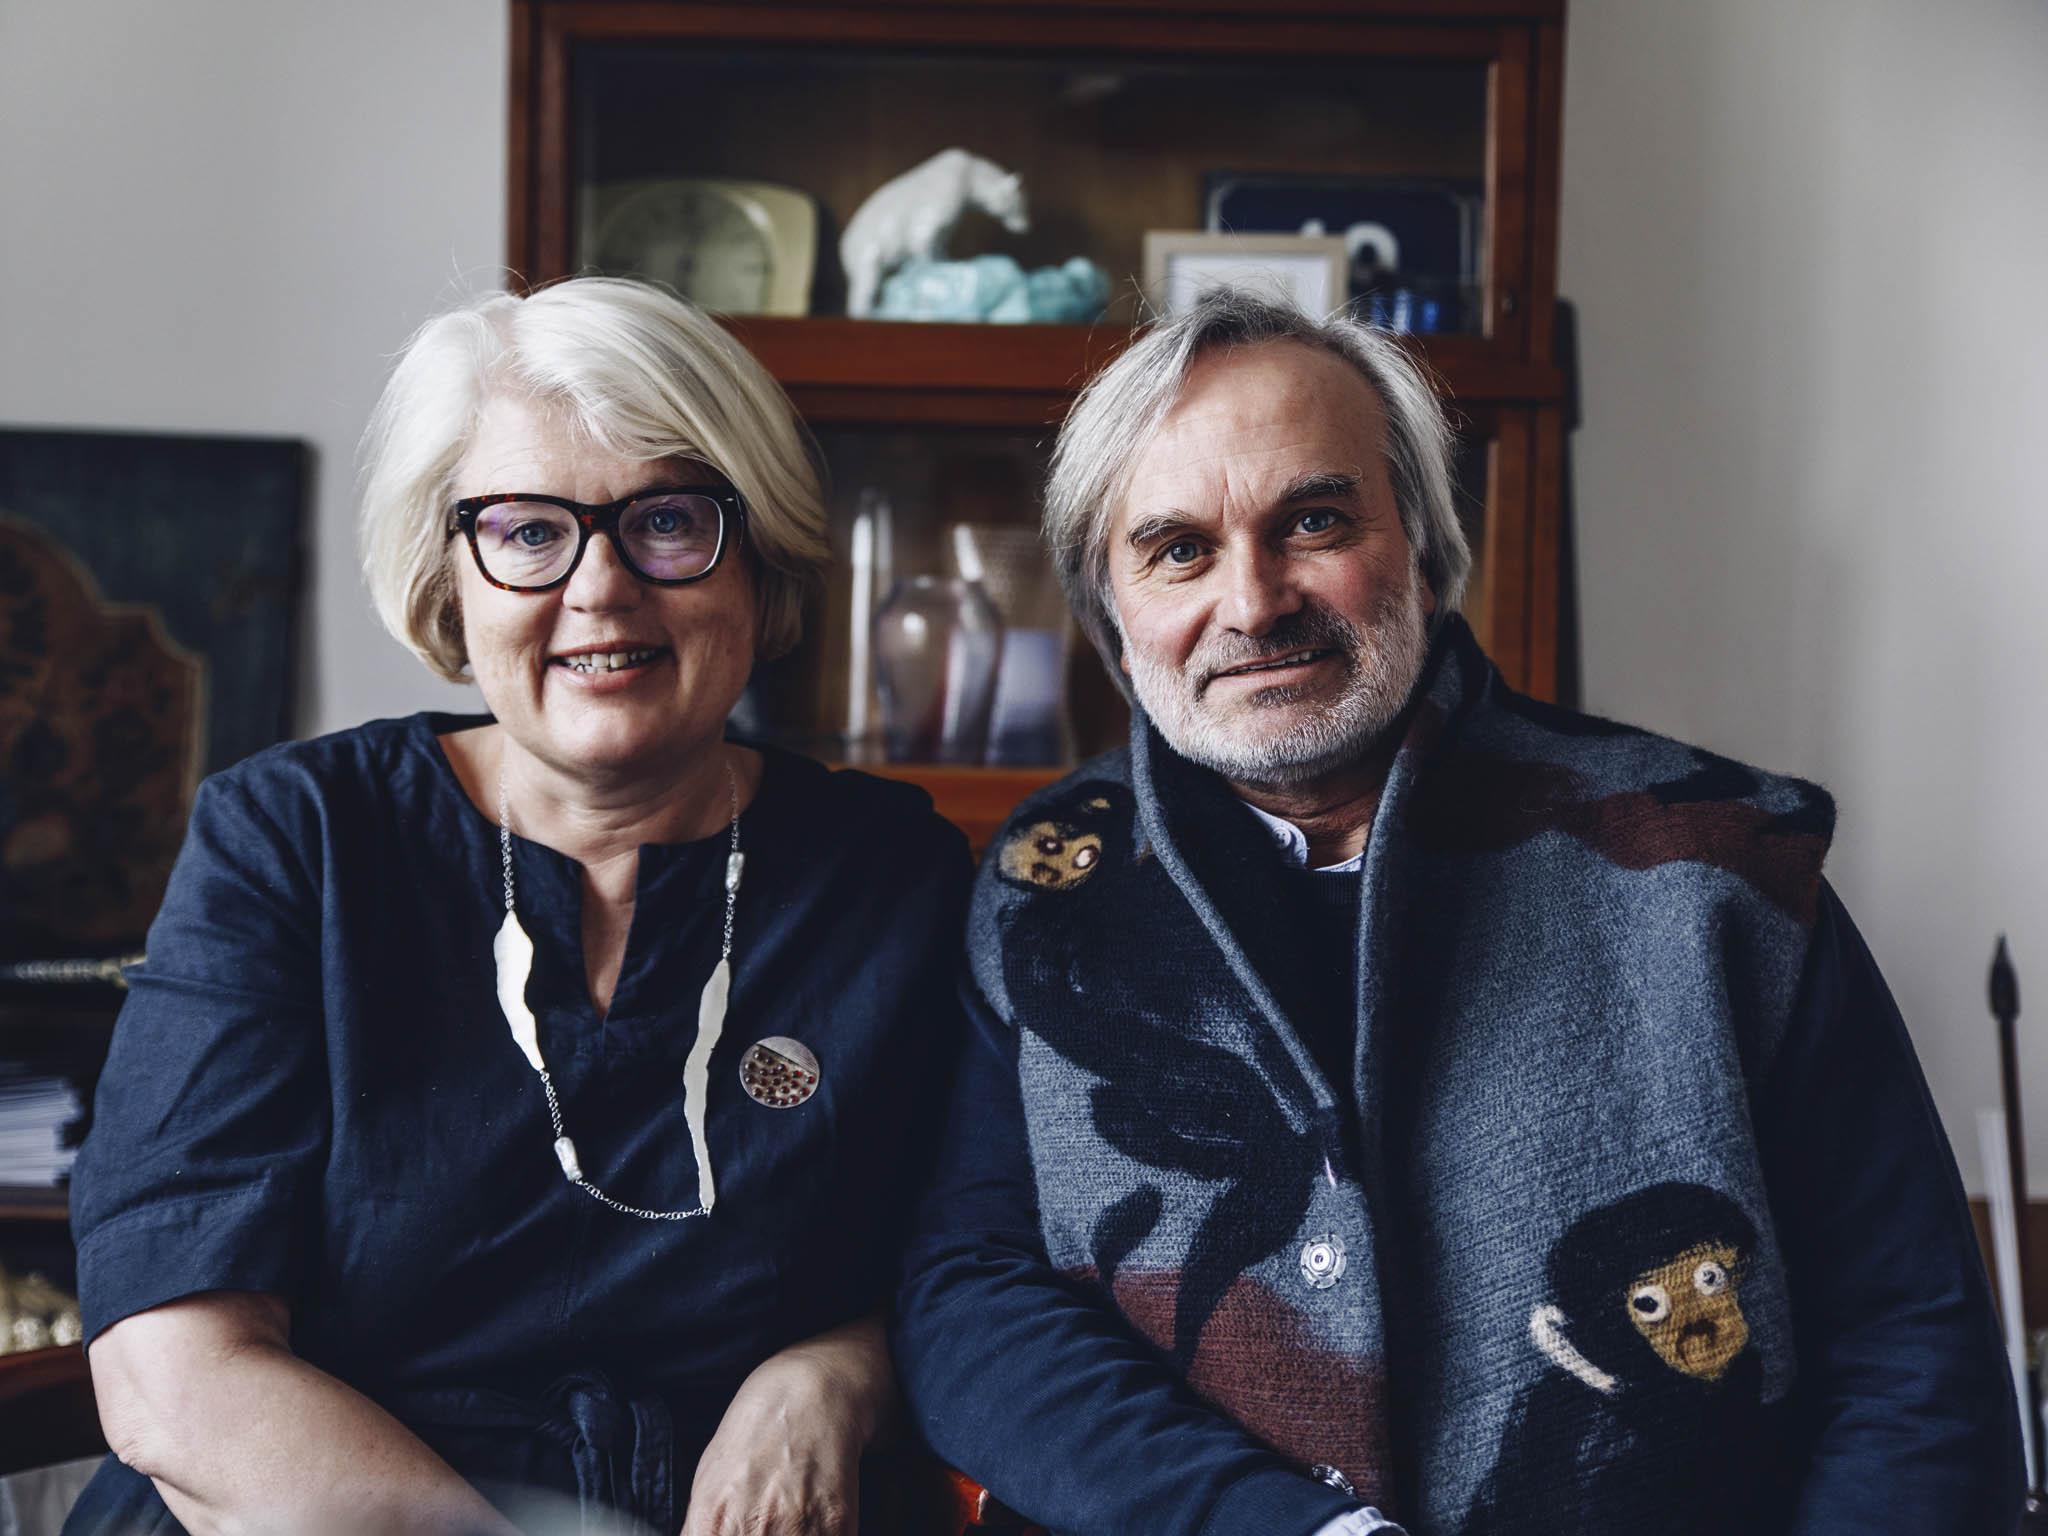 Zakladatelé Happy Materials Lucie Havlová aTomáš Hendrych